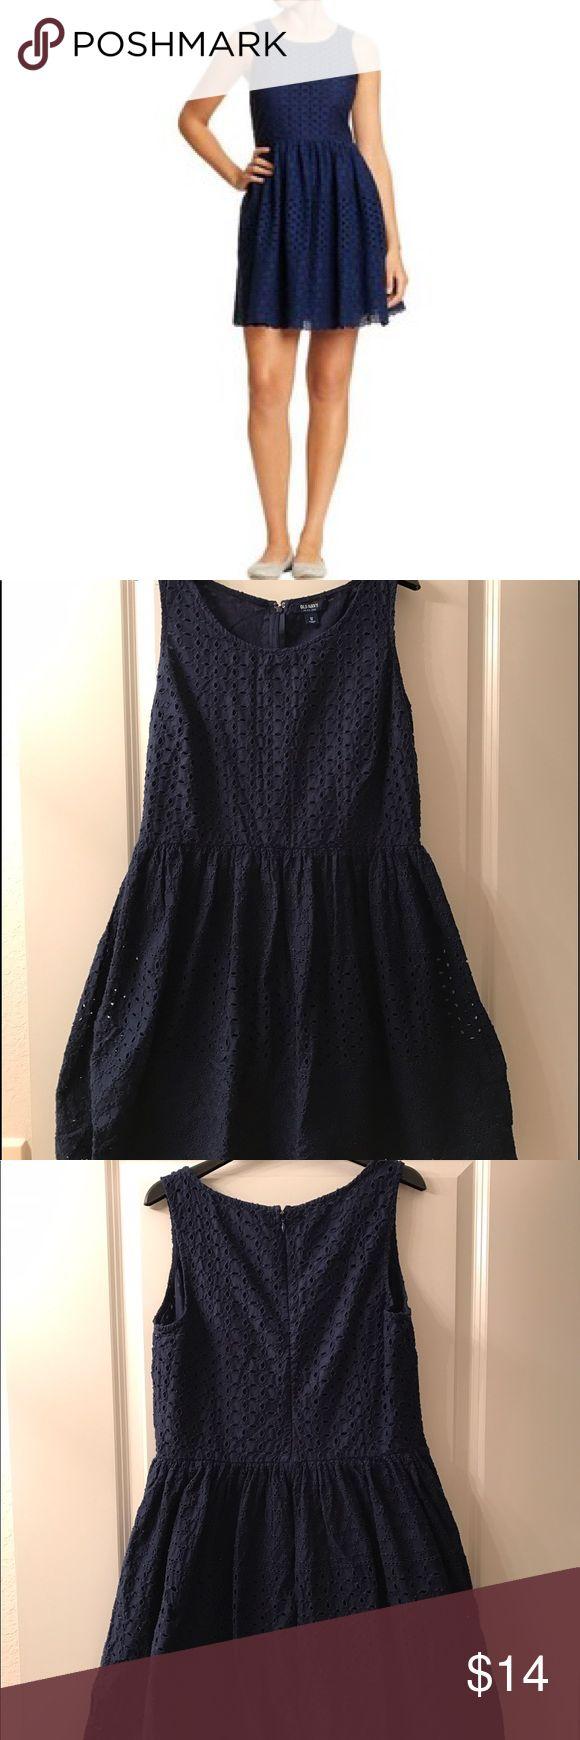 Old Navy Dress Old Navy navy blue eyelet dress Old Navy Dresses